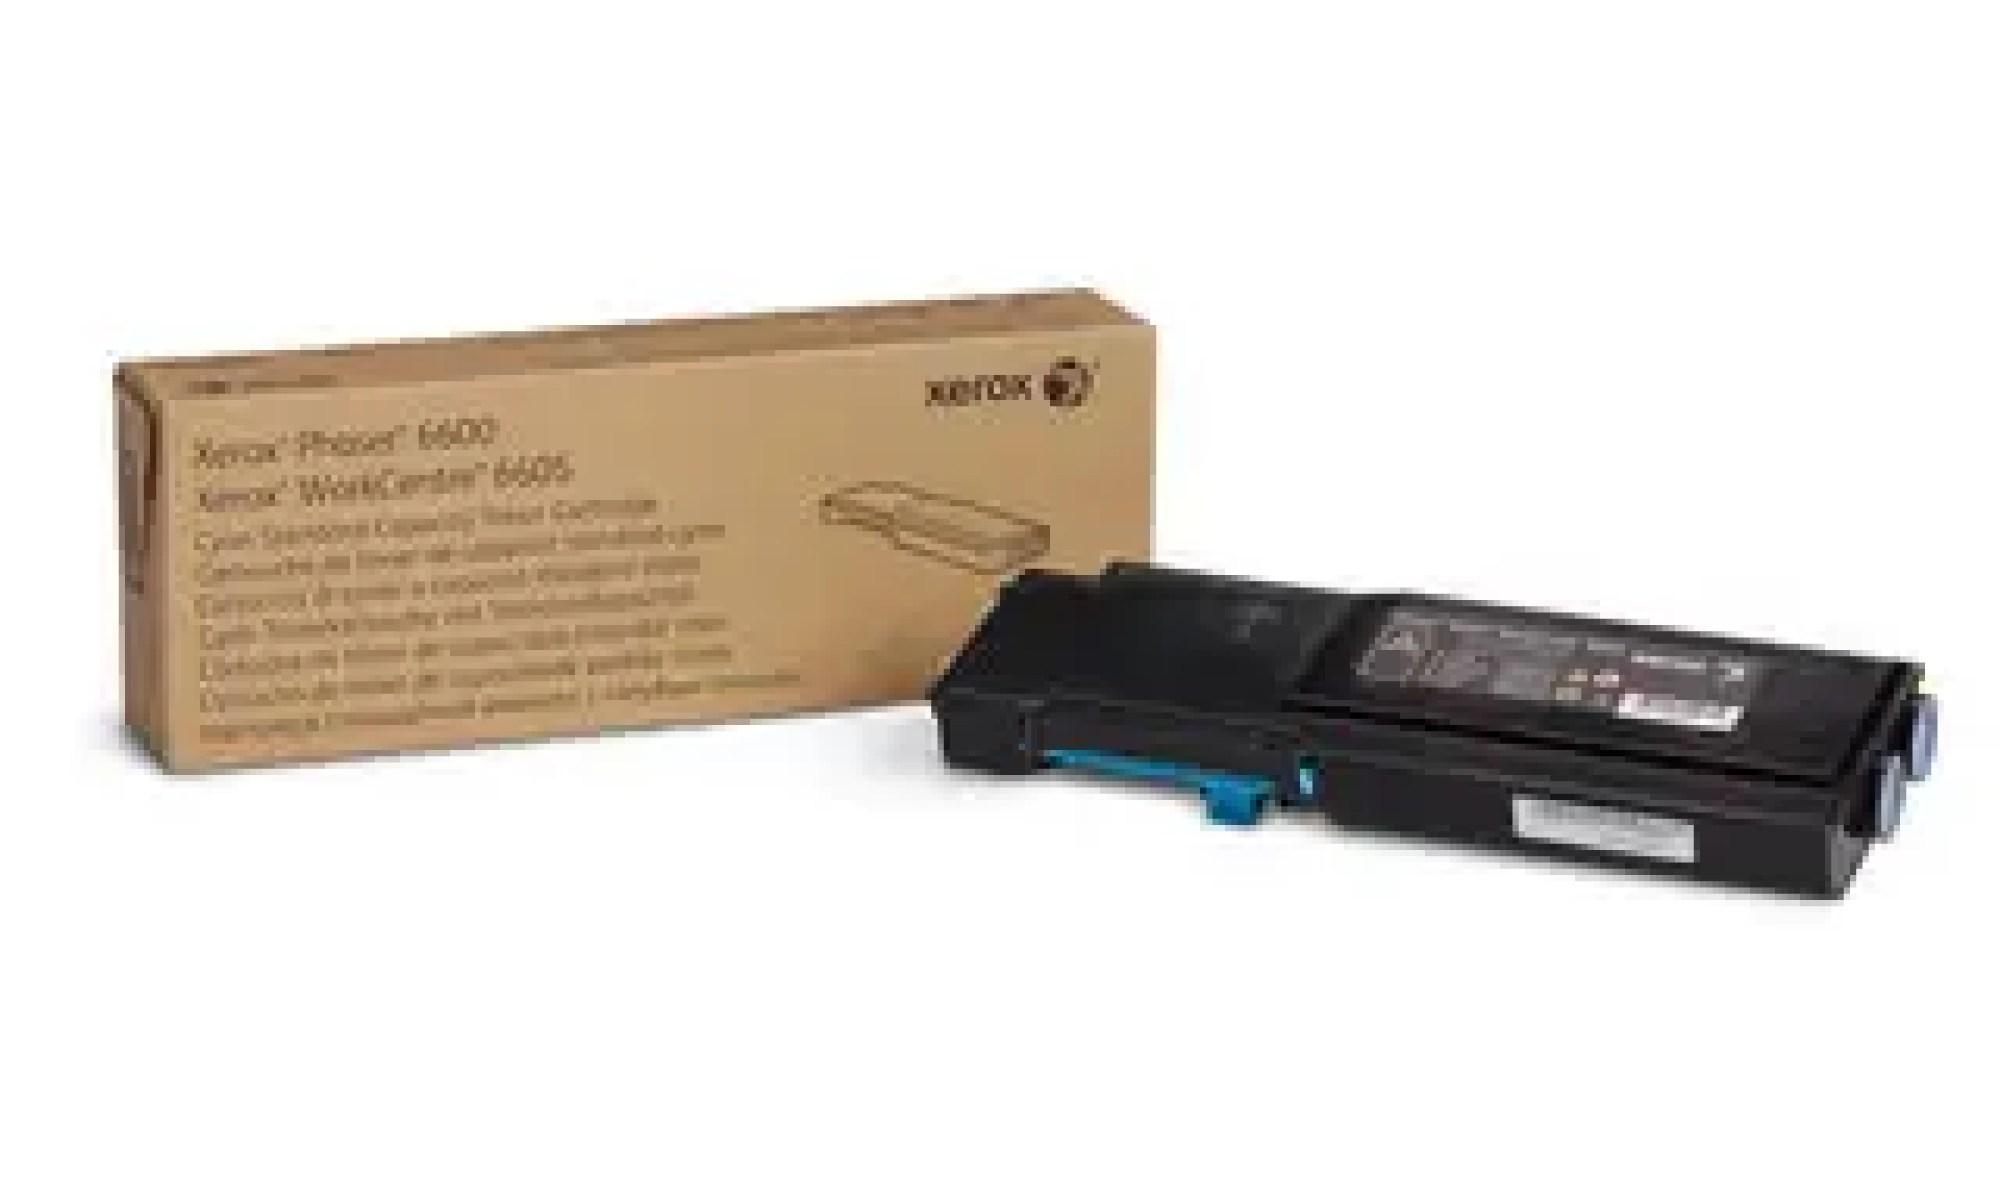 106R02249 Toner capacitate mica cyan pentru Phaser 6600, WorkCentre 6605